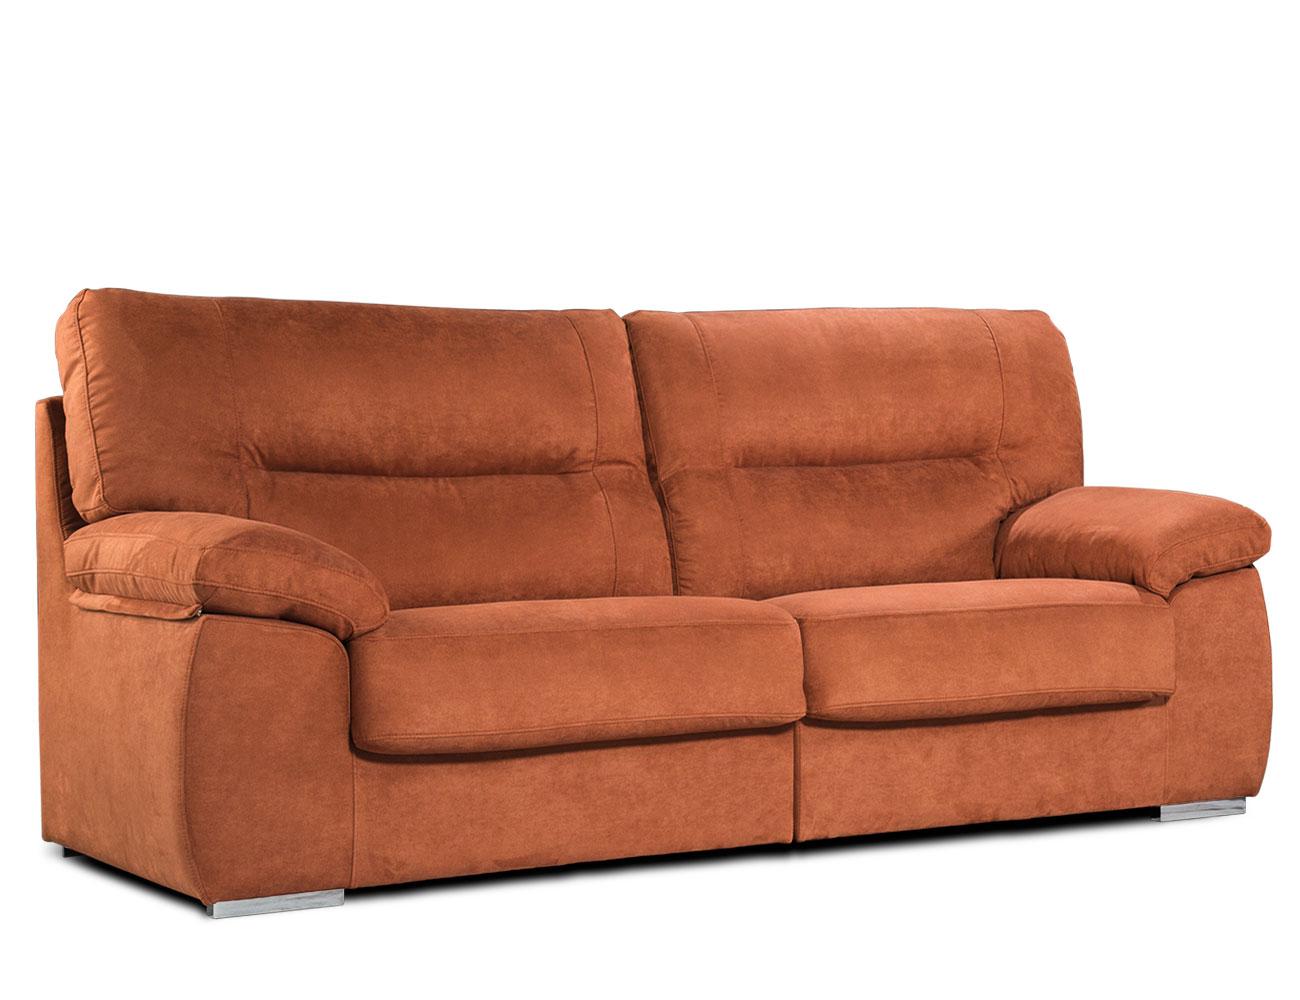 Sofa 3 plazas caldera